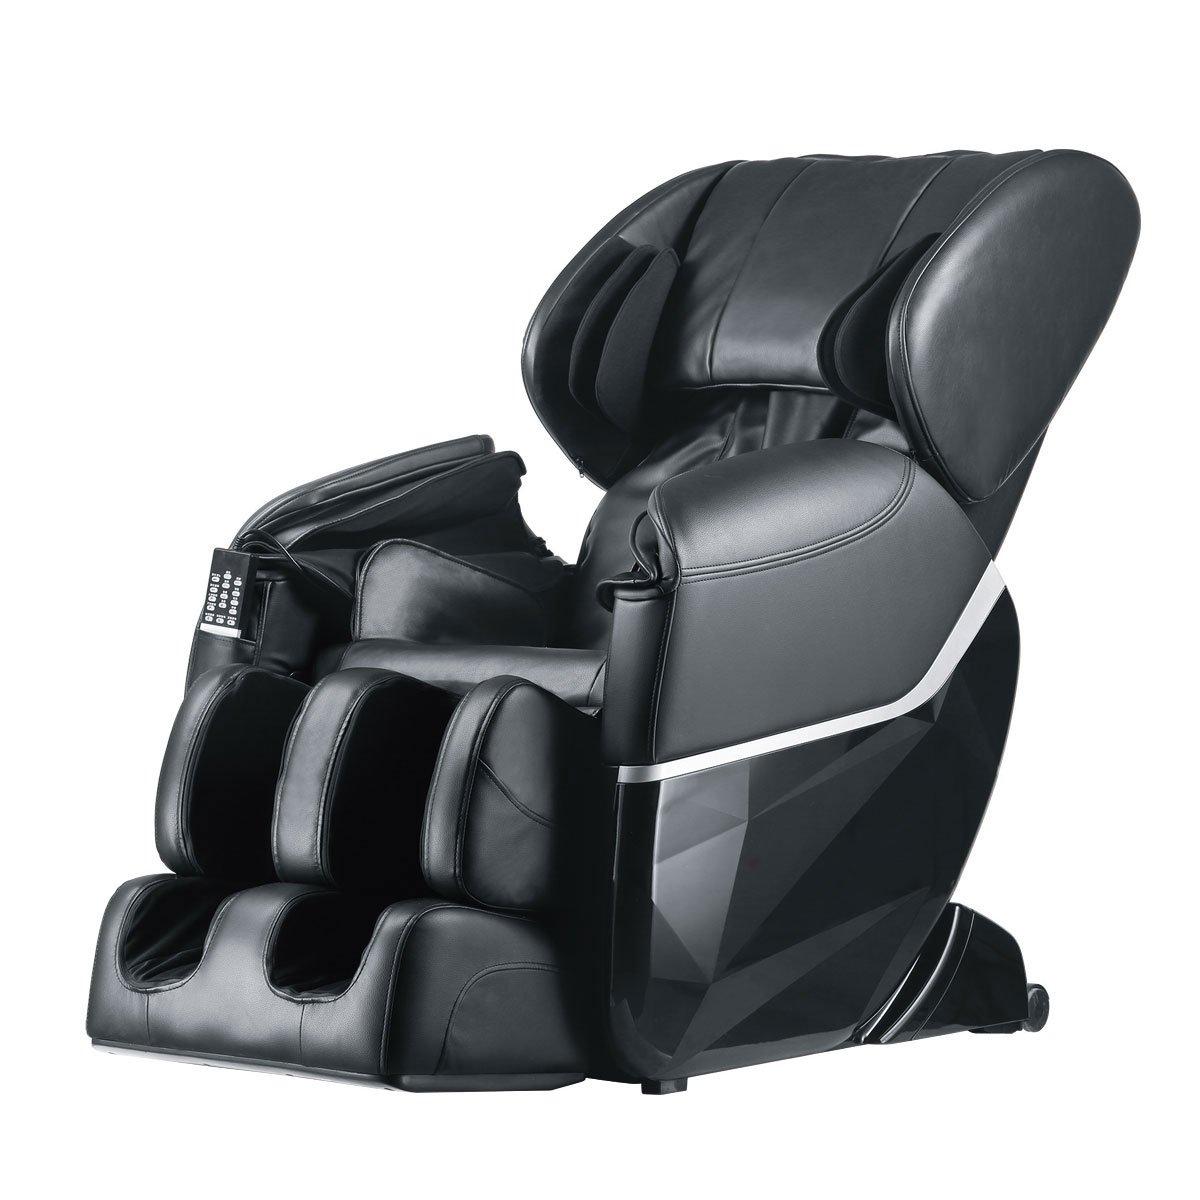 Amazon.com: Electric Full Body Shiatsu Massage Chair Foot Roller Zero  Gravity w/Heat (massage chair): Beauty